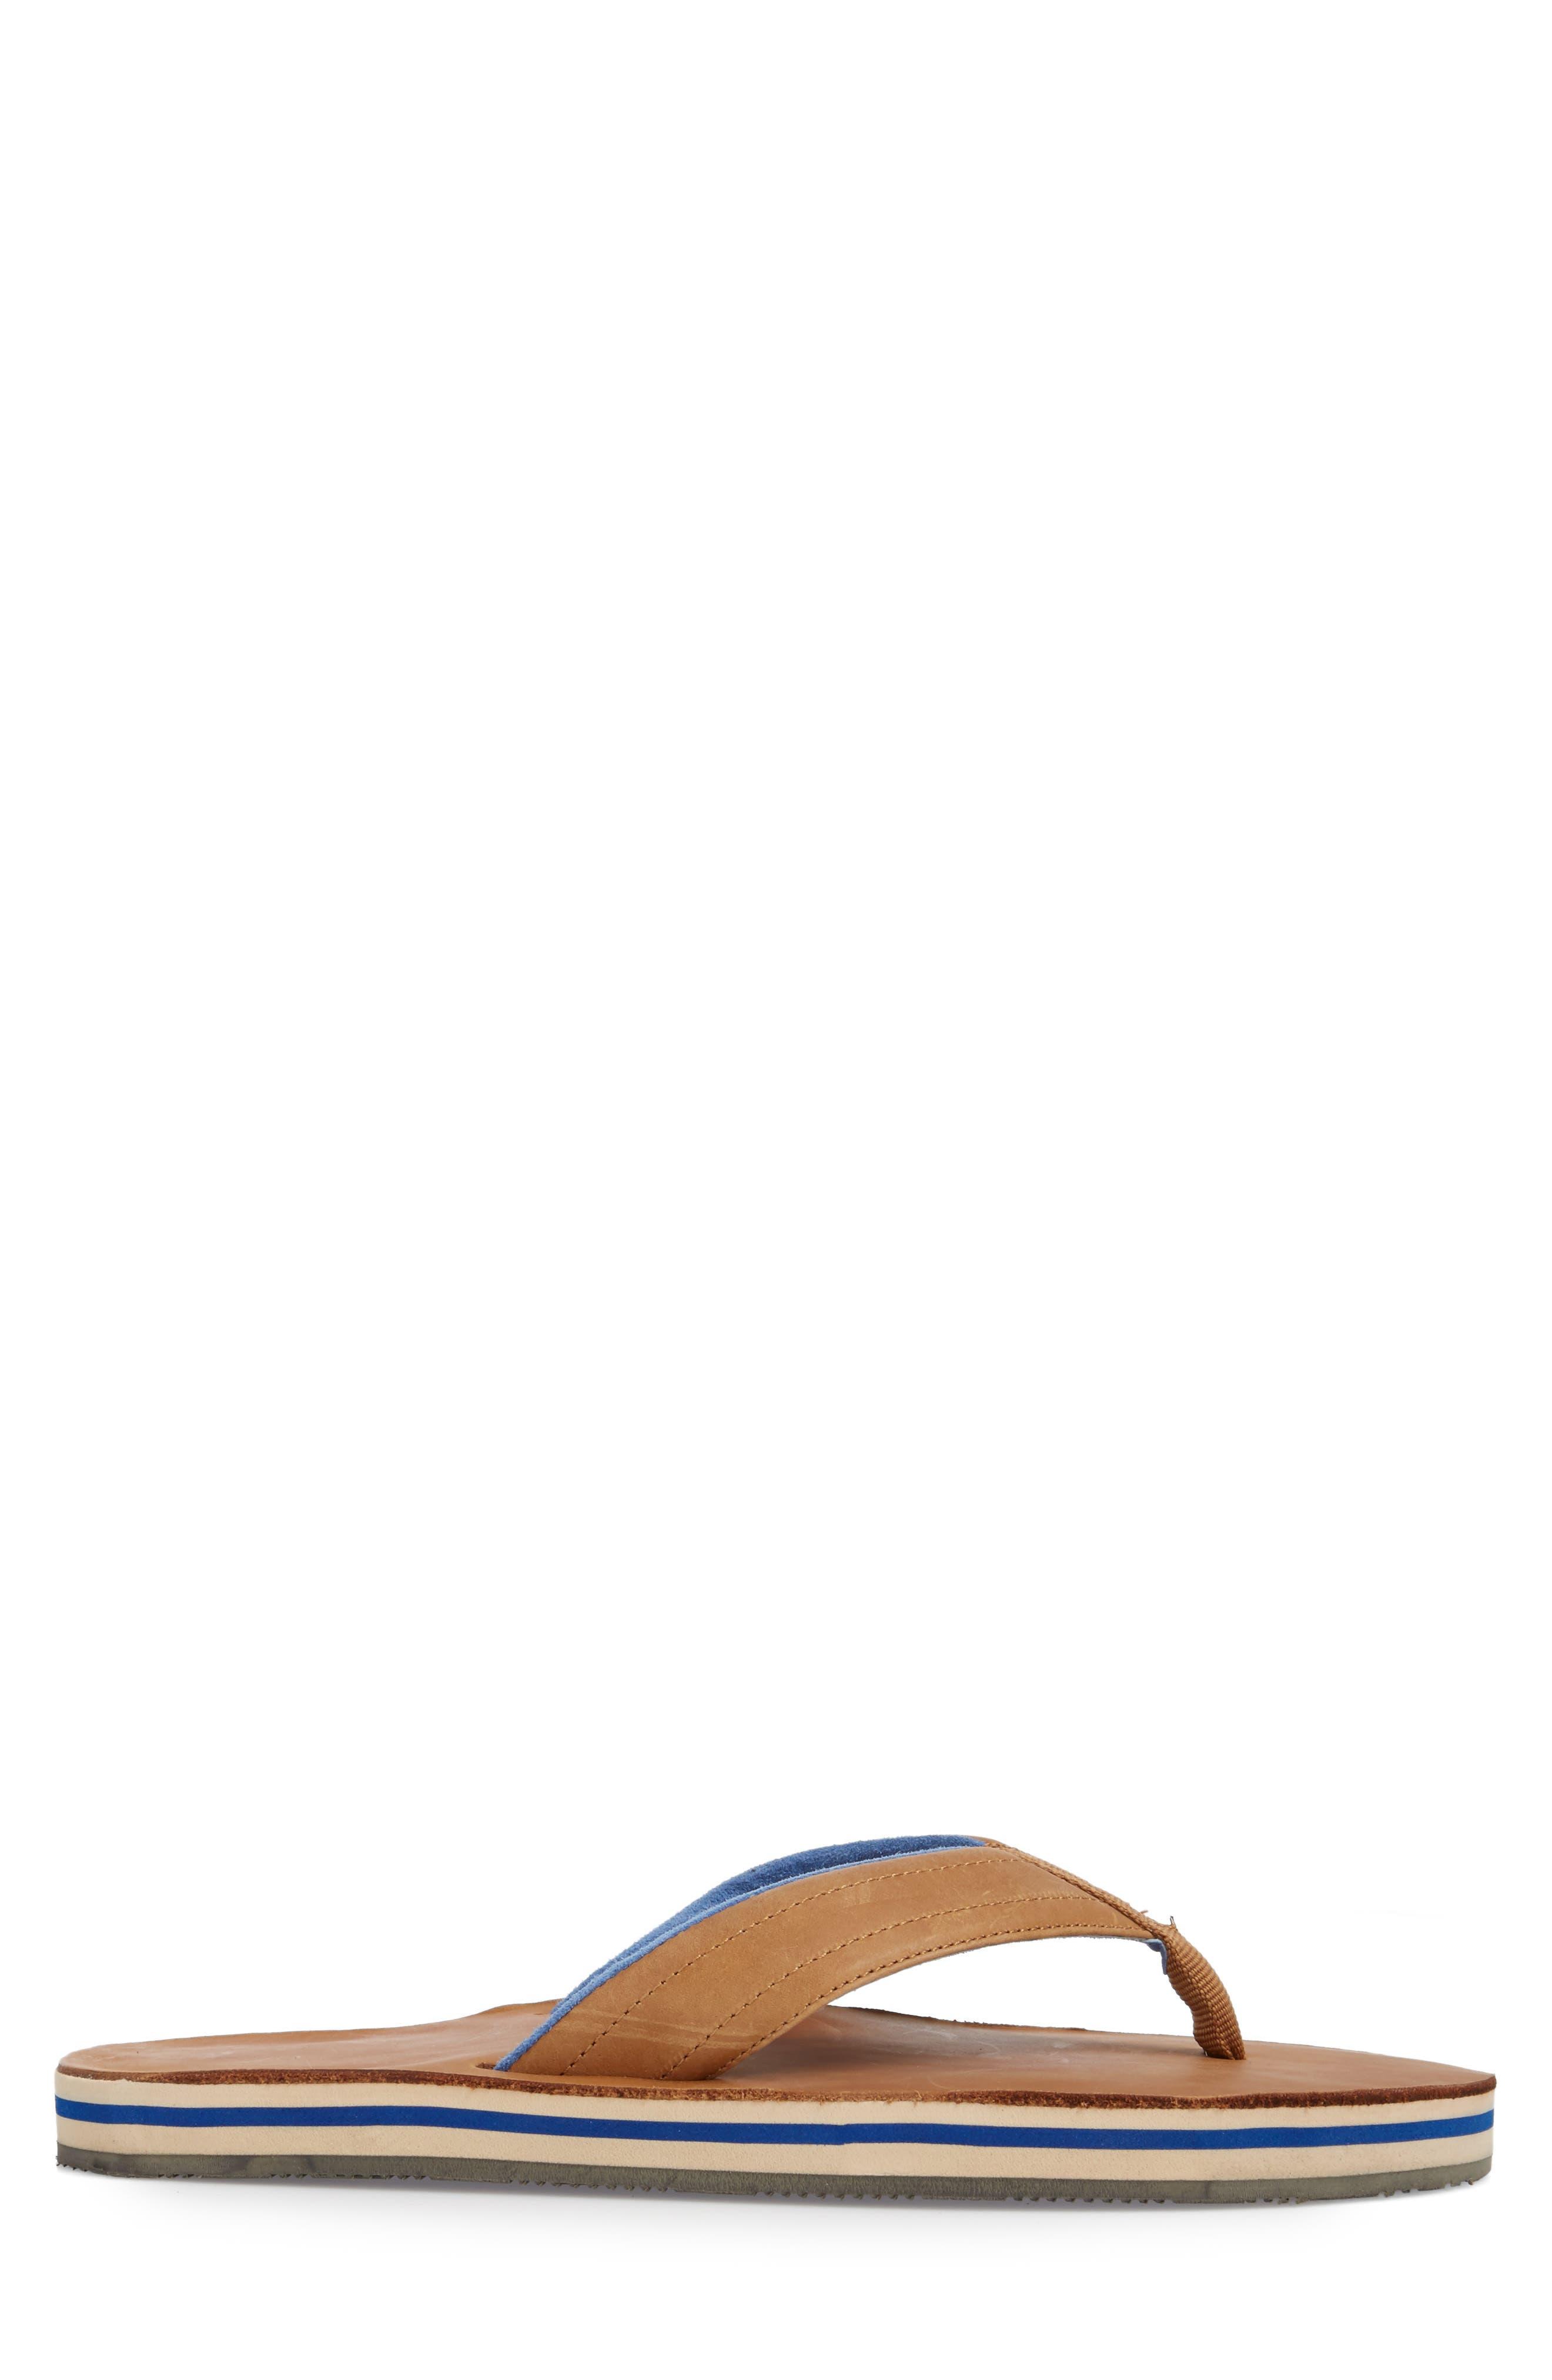 Lakes Sandwich Stripe Flip Flop,                             Alternate thumbnail 3, color,                             Tan/ Navy Leather